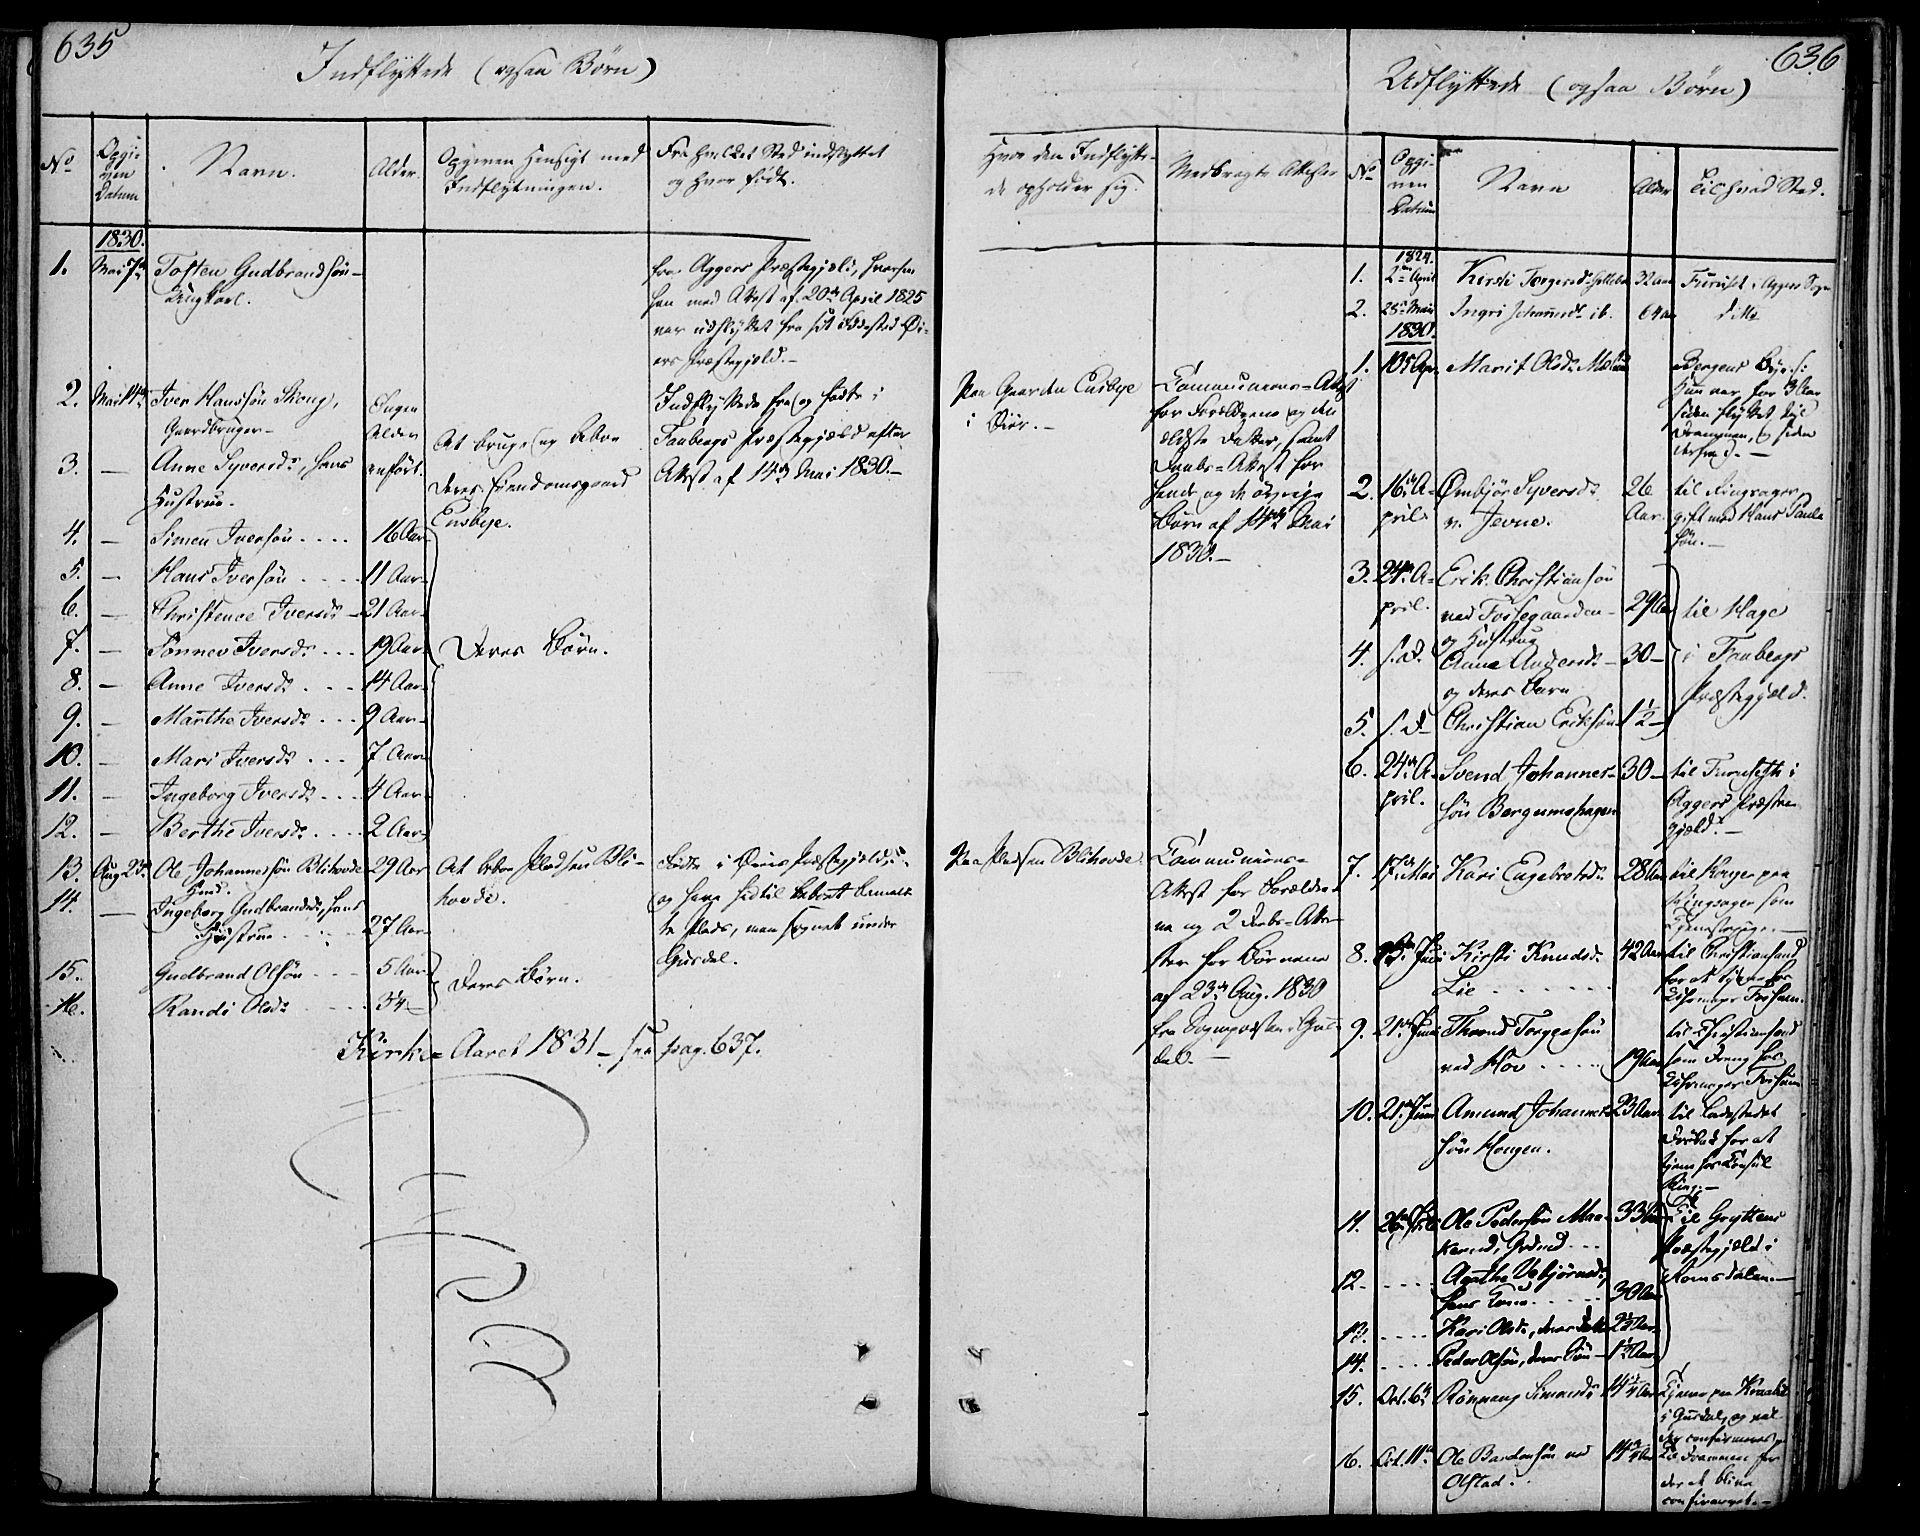 SAH, Øyer prestekontor, Ministerialbok nr. 4, 1824-1841, s. 635-636